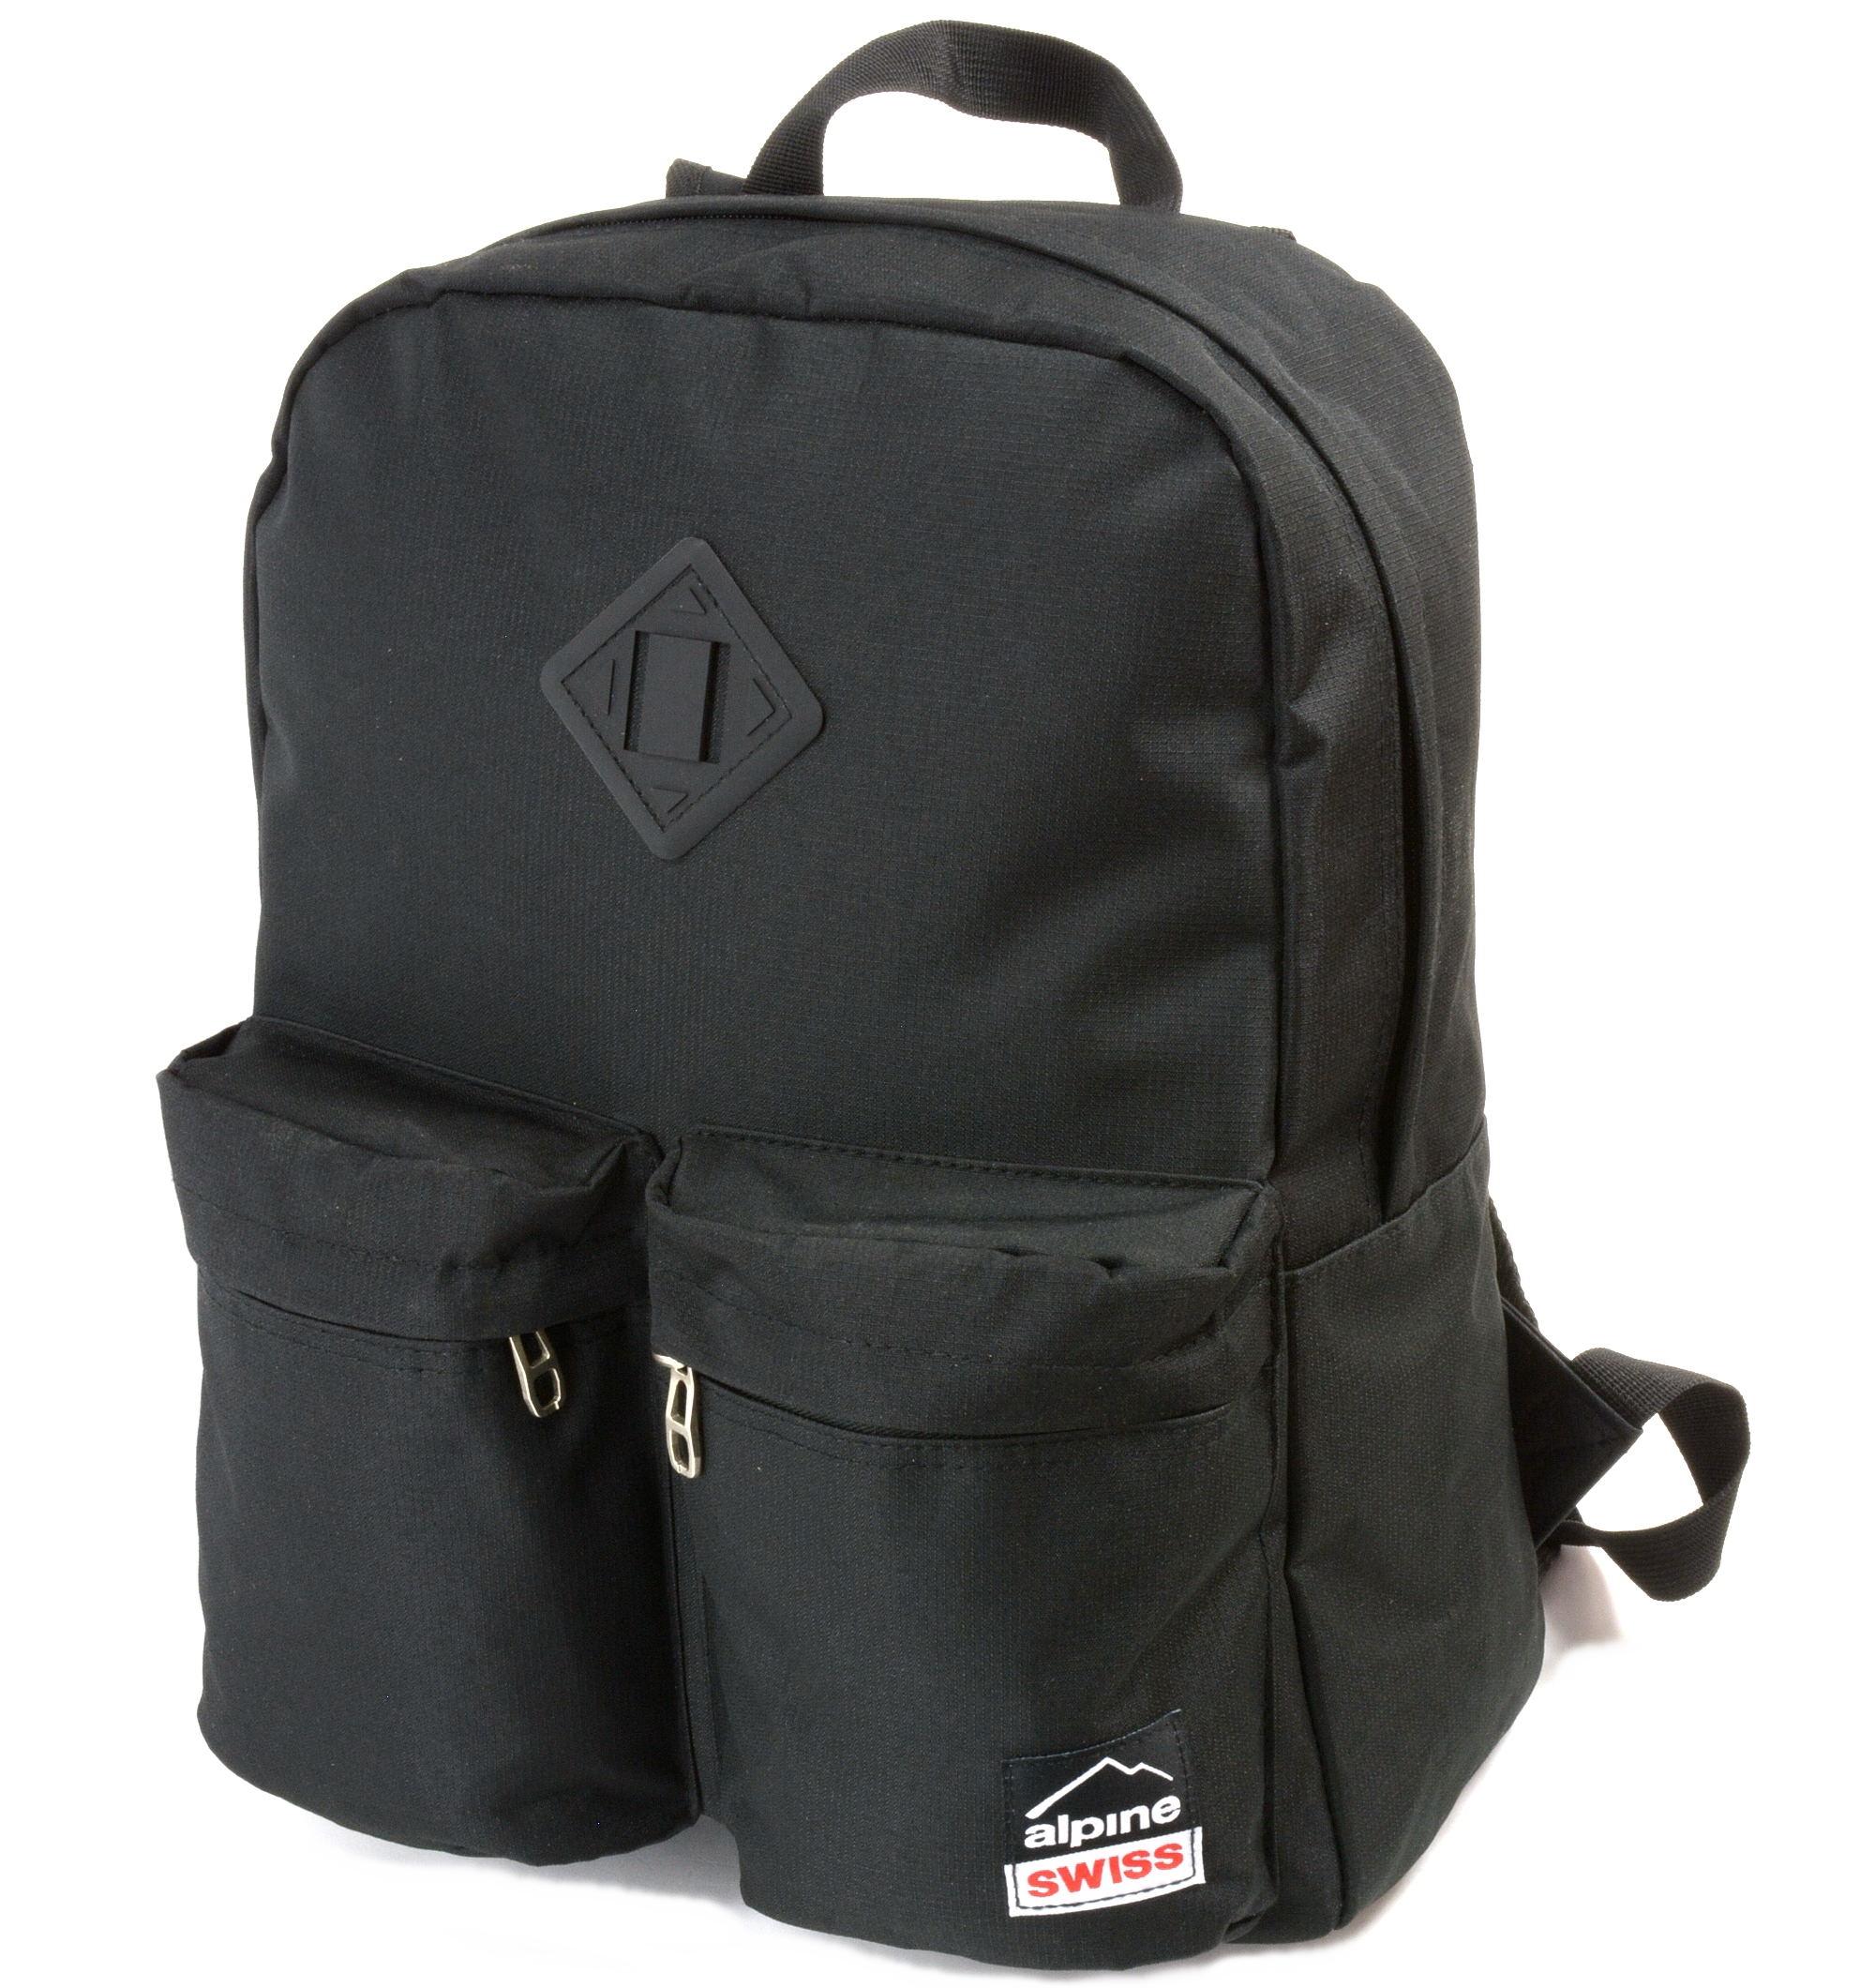 Alpine Swiss Major Back Pack Bookbag School Bag Daypack 1 Year Warranty Backpack